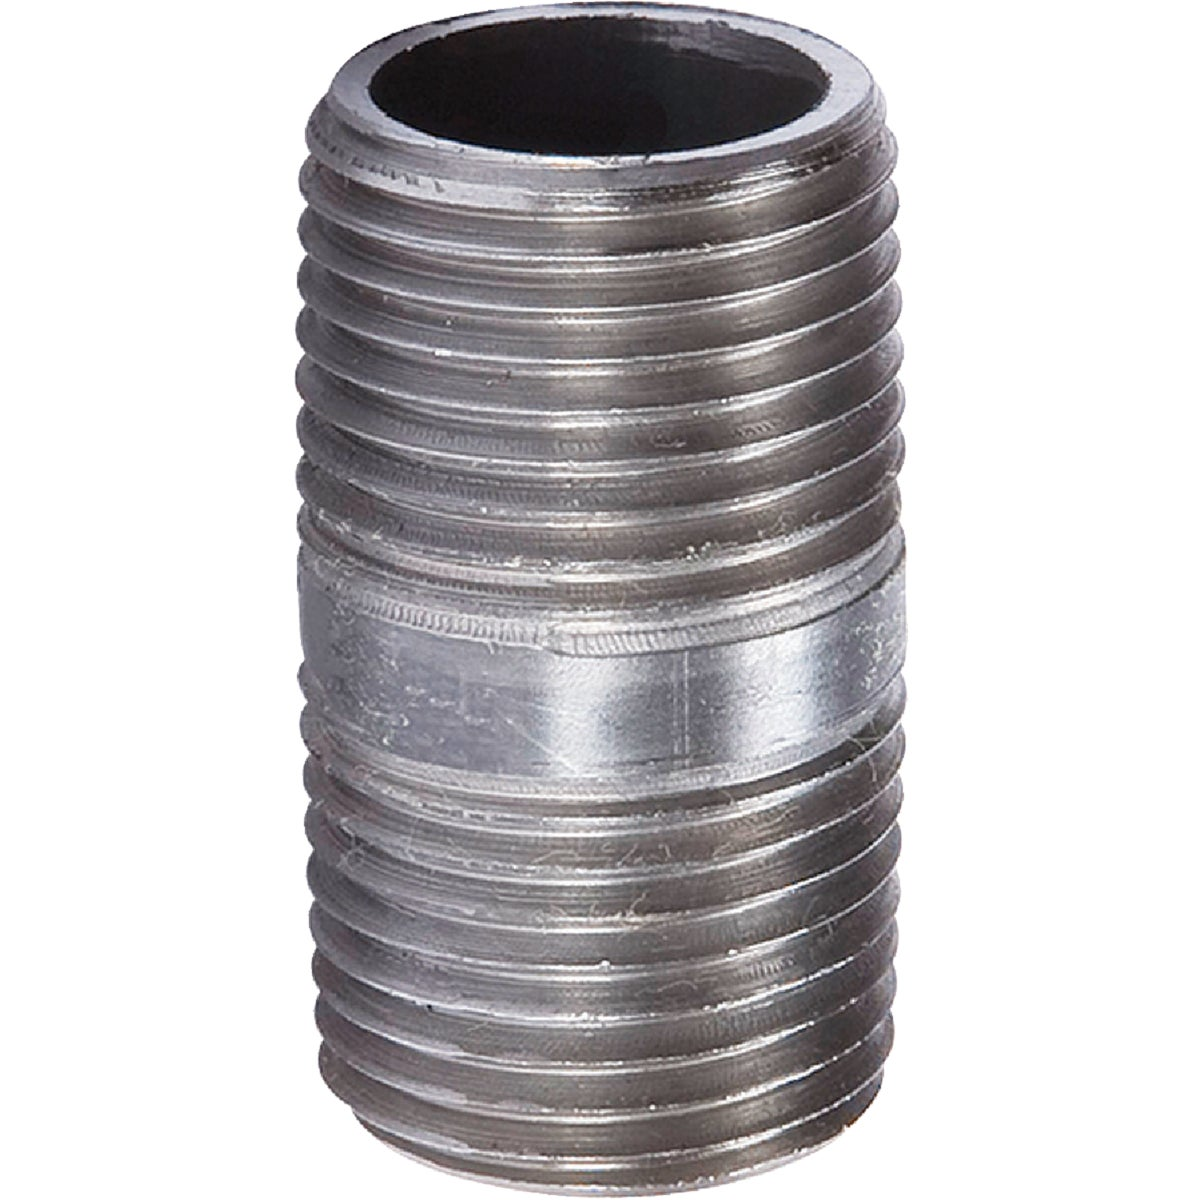 Southland Pipe Nipple 3/4XCLOSE BLACK NIPPLE 20500